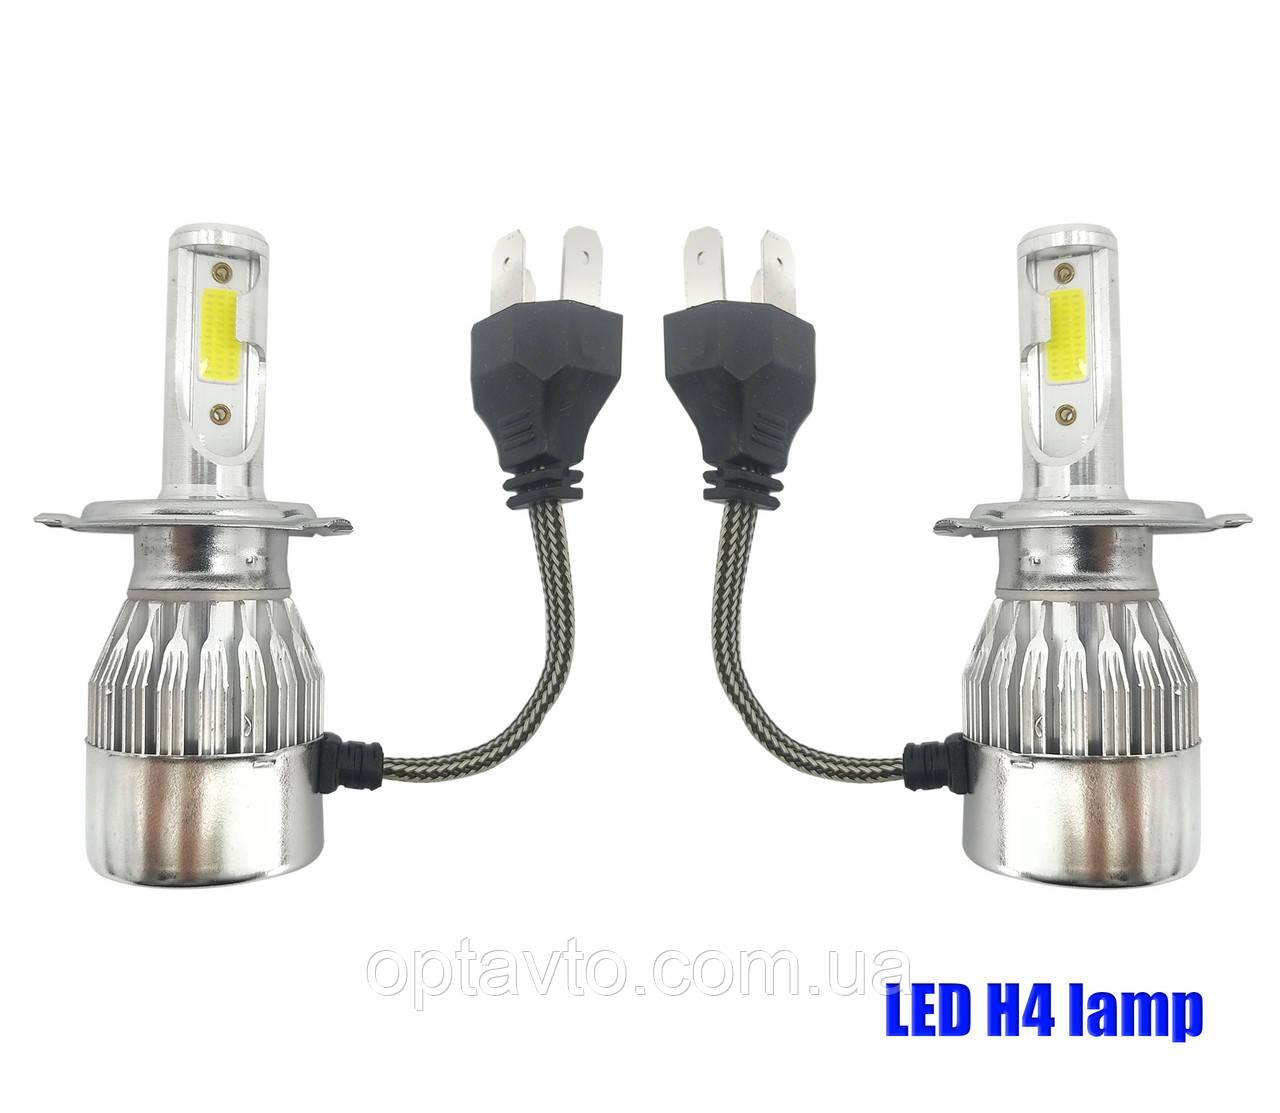 Комплект LED ламп H4 ближний и дальний свет HeadLight. Активный кулер. 6000К. 4500lm